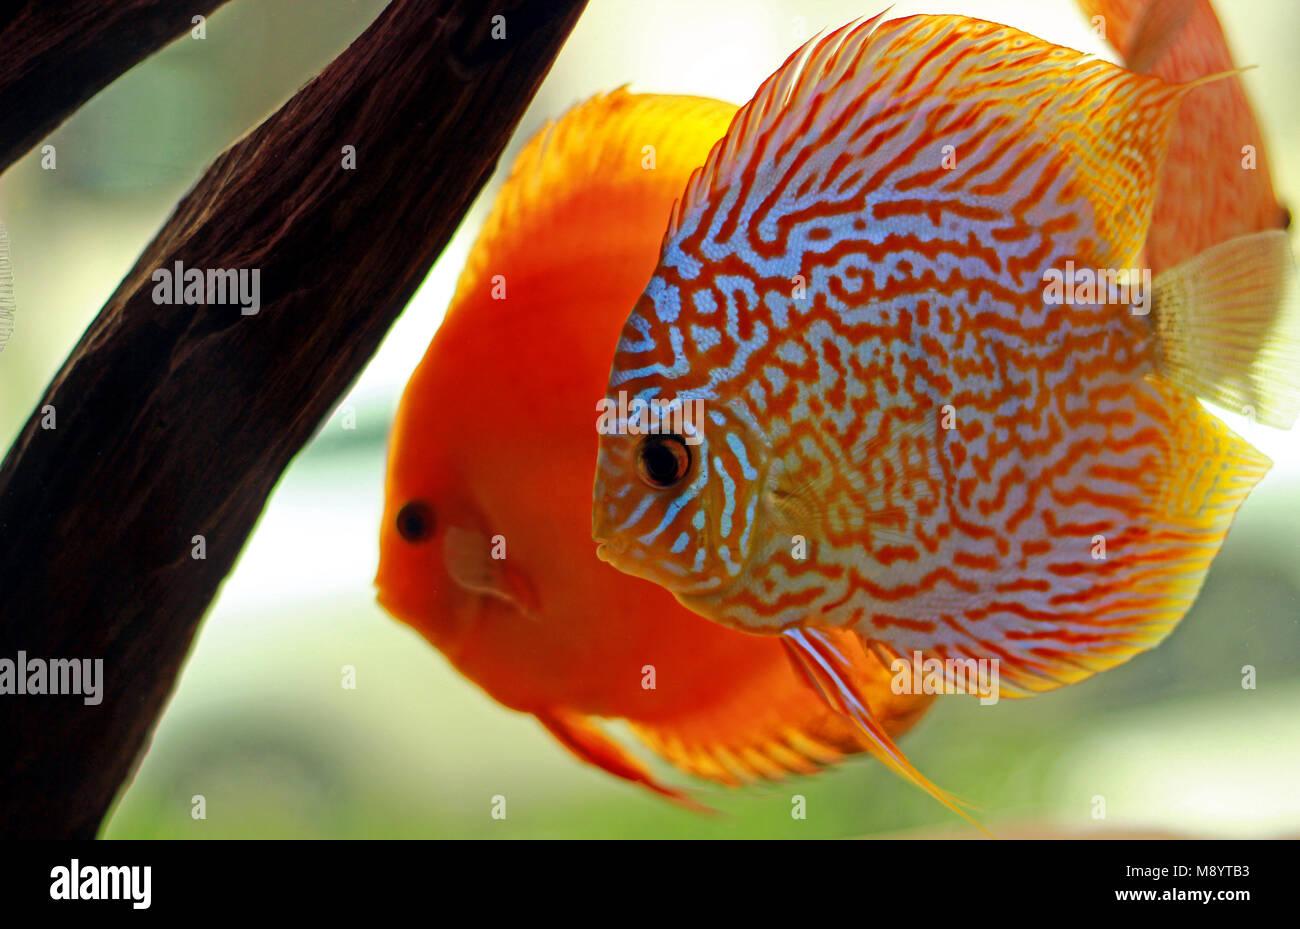 Discus Fish White Background Stock Photos & Discus Fish White ...